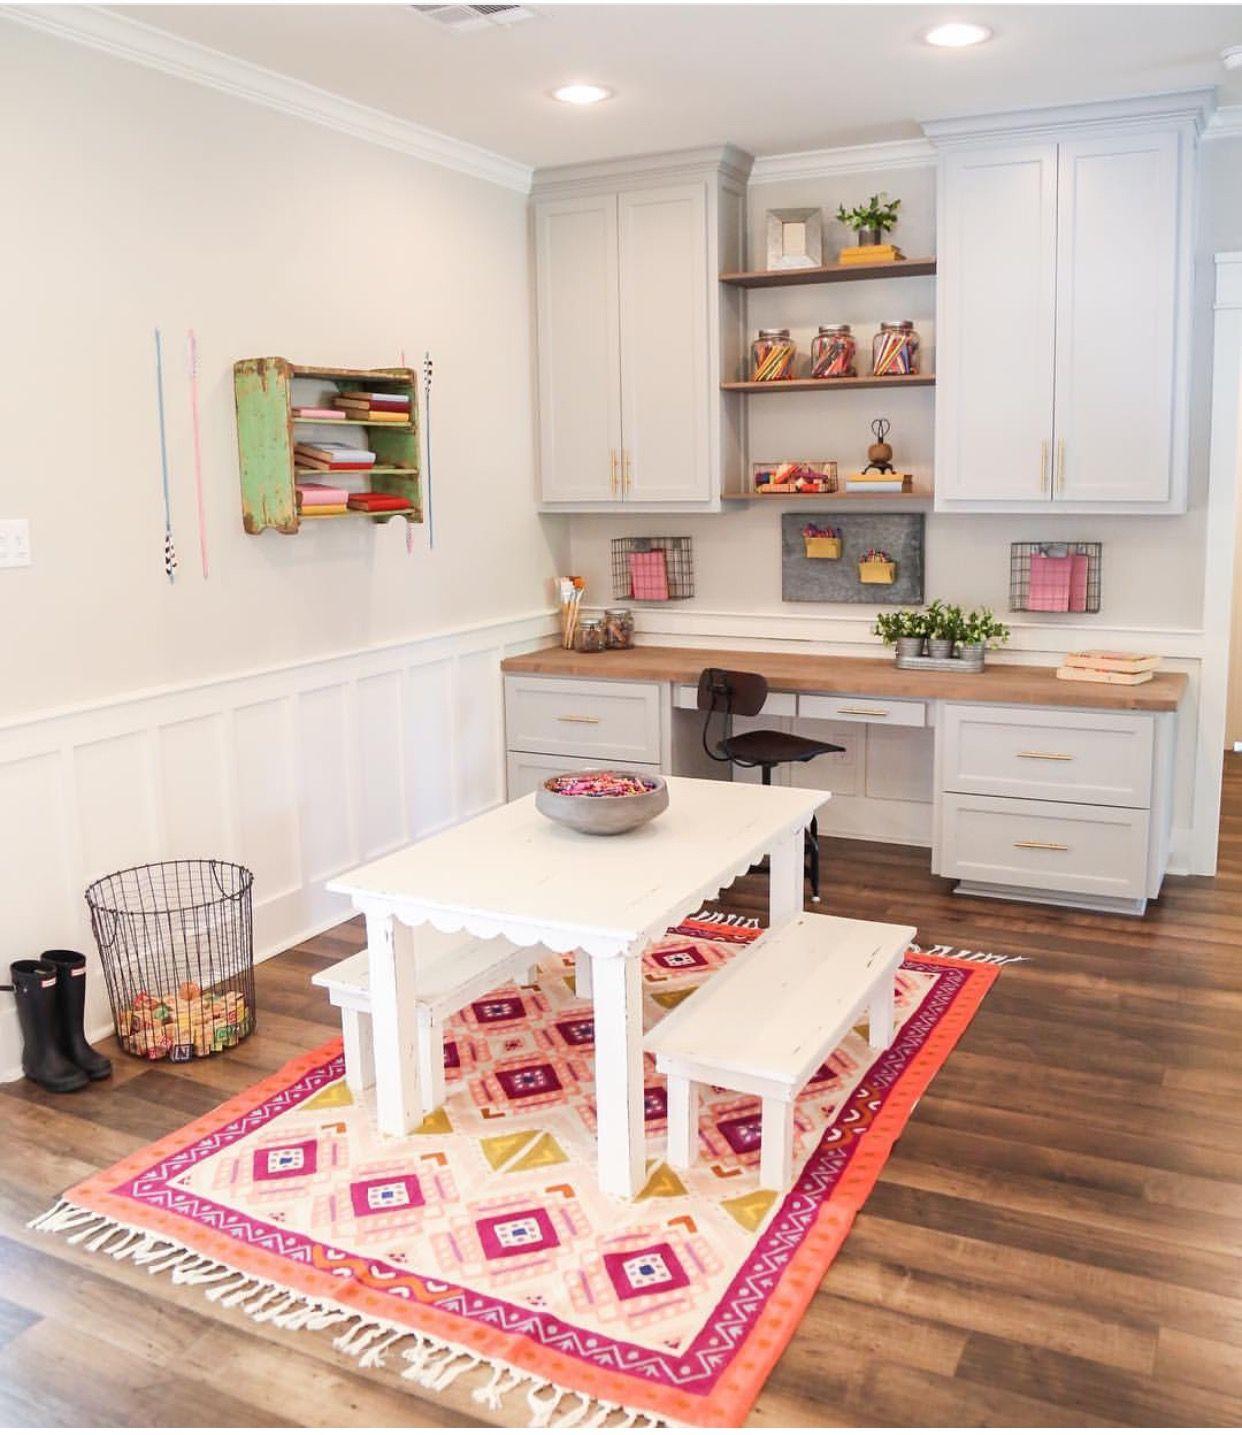 office playroom ideas. Room · Baby PlayroomOffice PlayroomPlayroom IdeasHome Office Playroom Ideas F